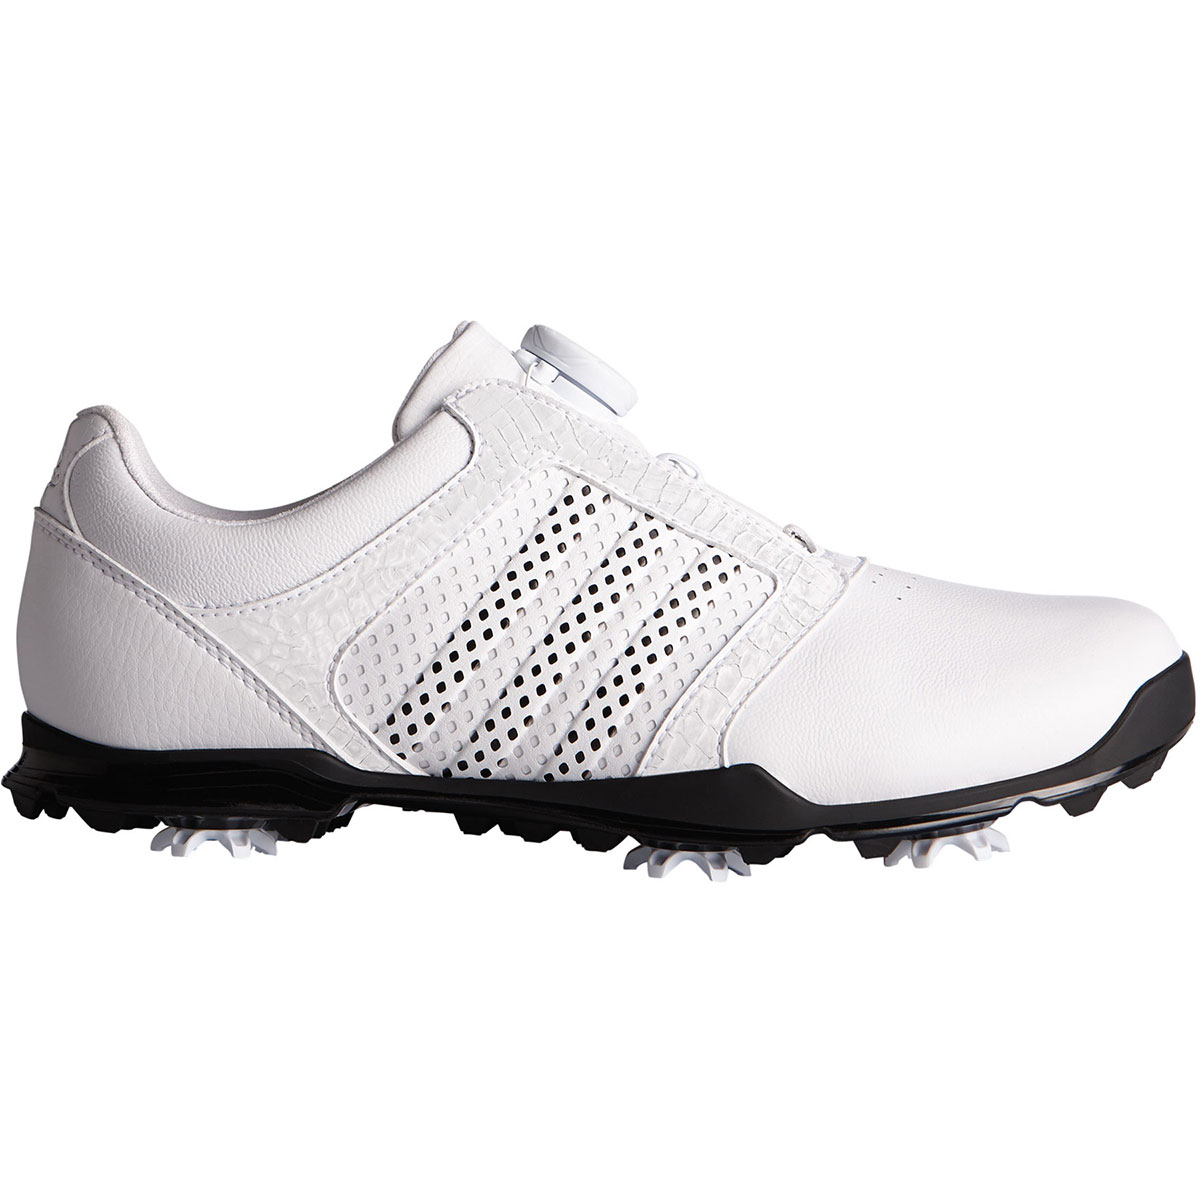 Chaussures adidas Golf Adipure BOA pour femmes